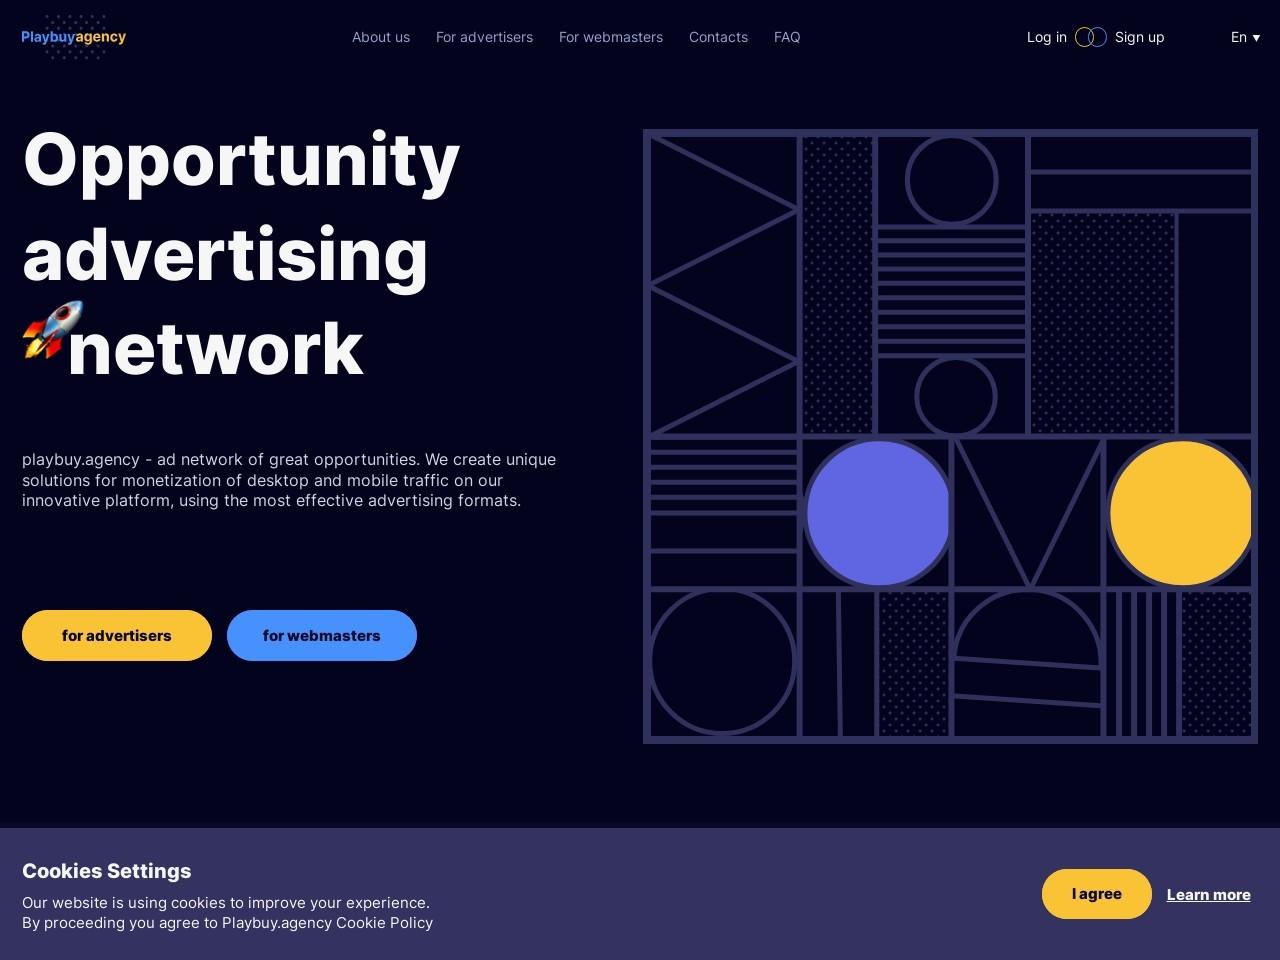 Playbuy